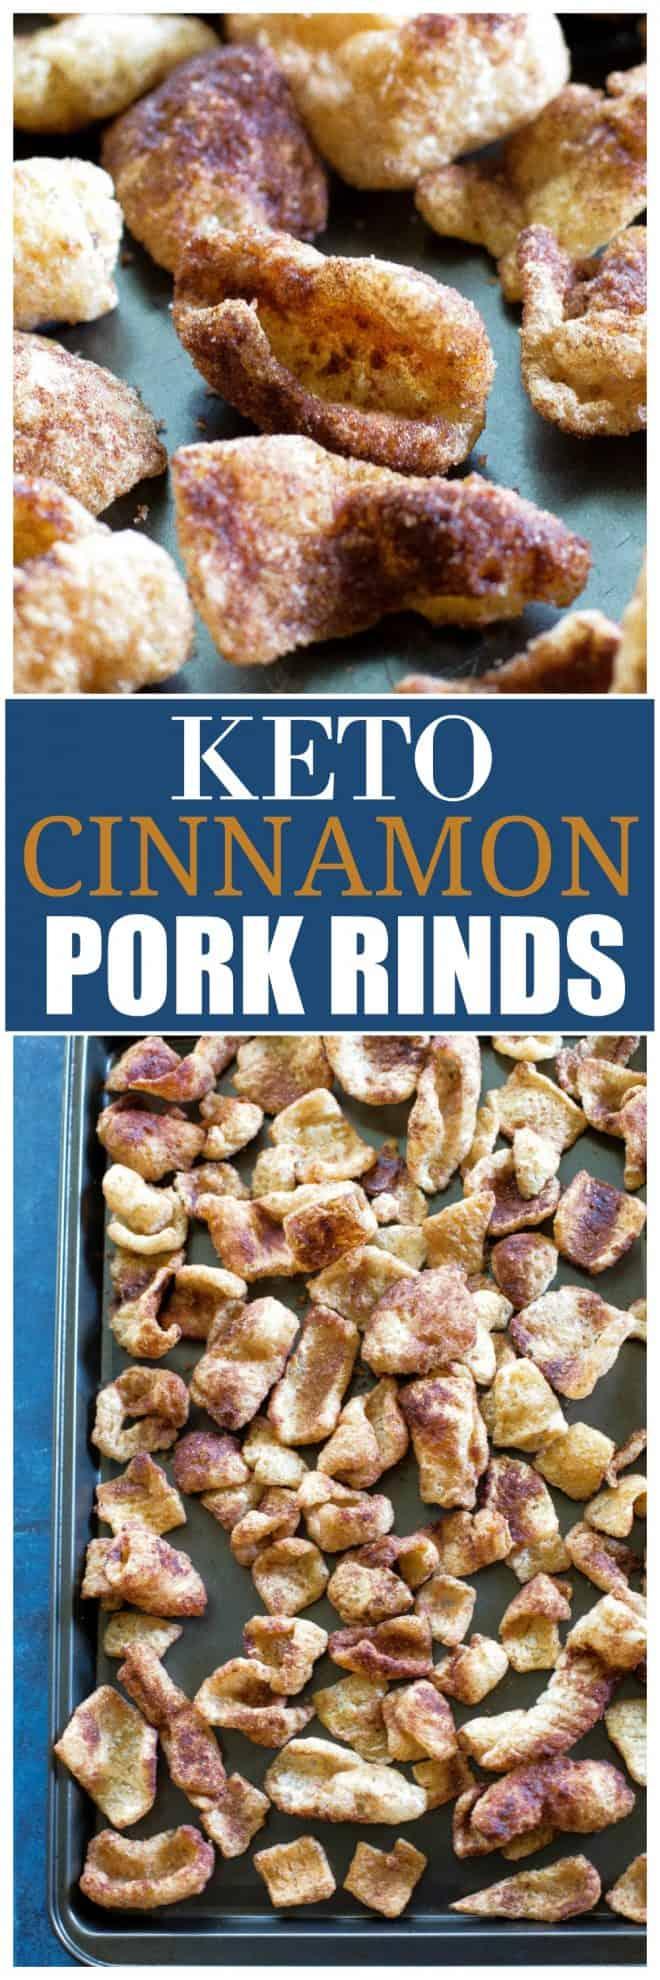 keto cinnamon pork rinds